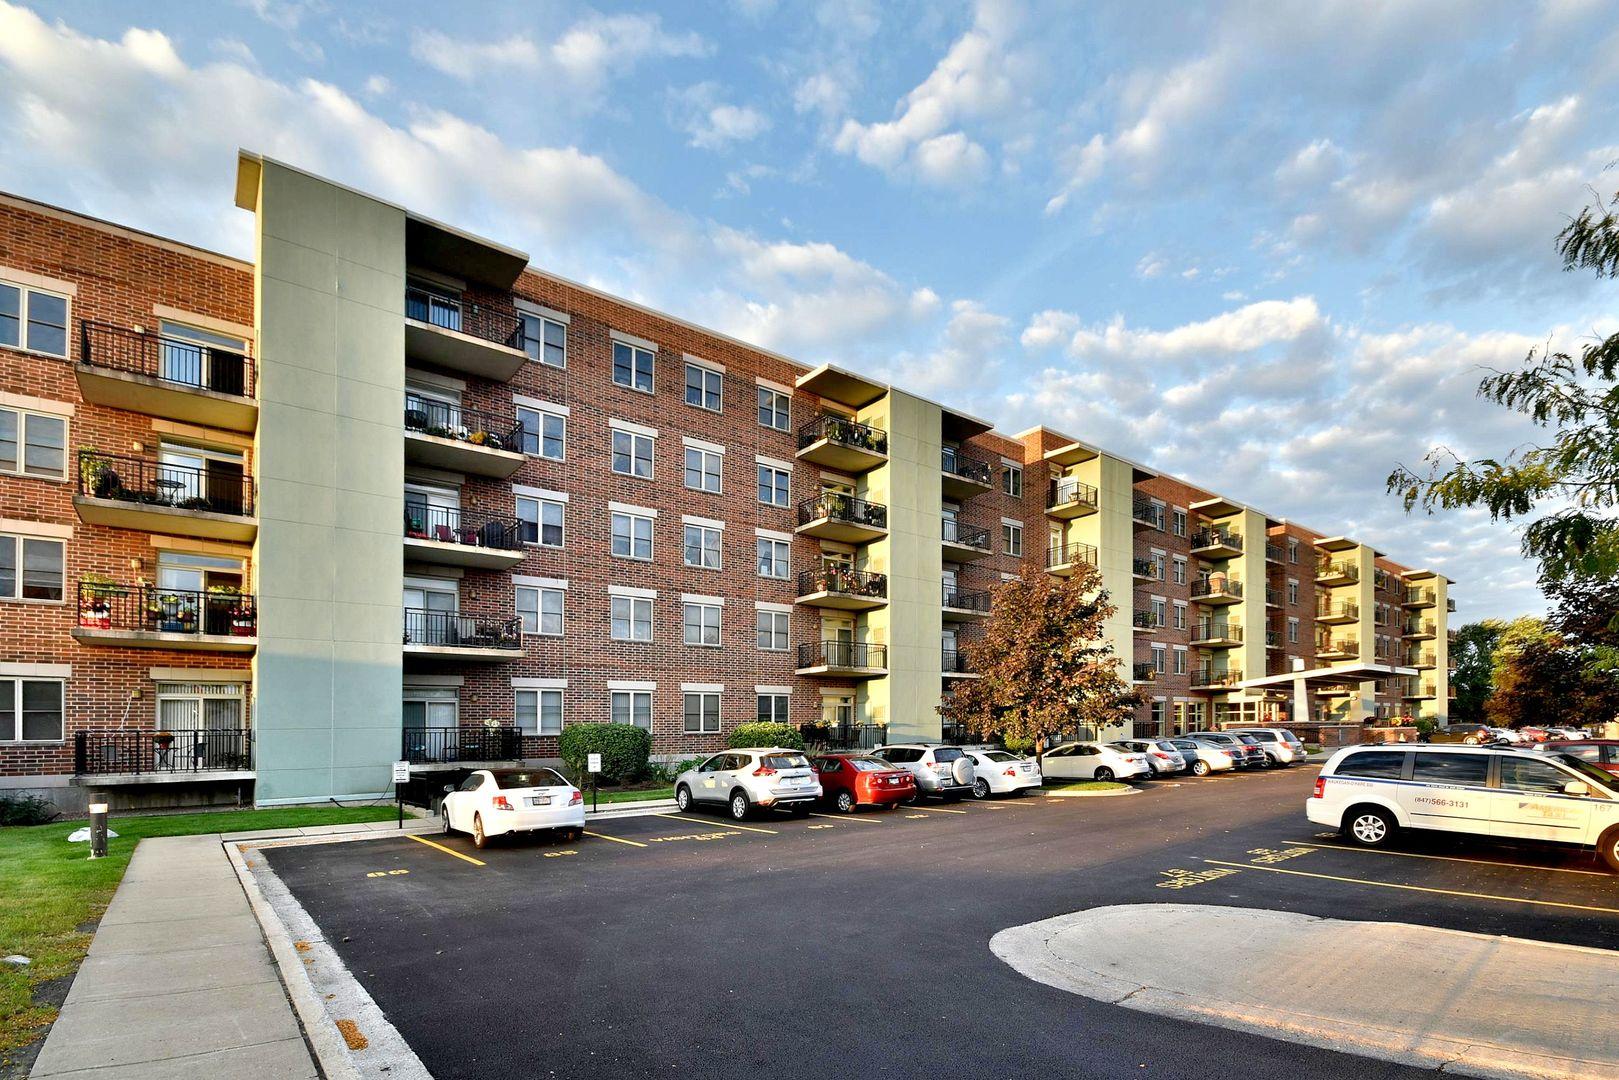 9355 Irving Park 311, Schiller Park, Illinois, 60176